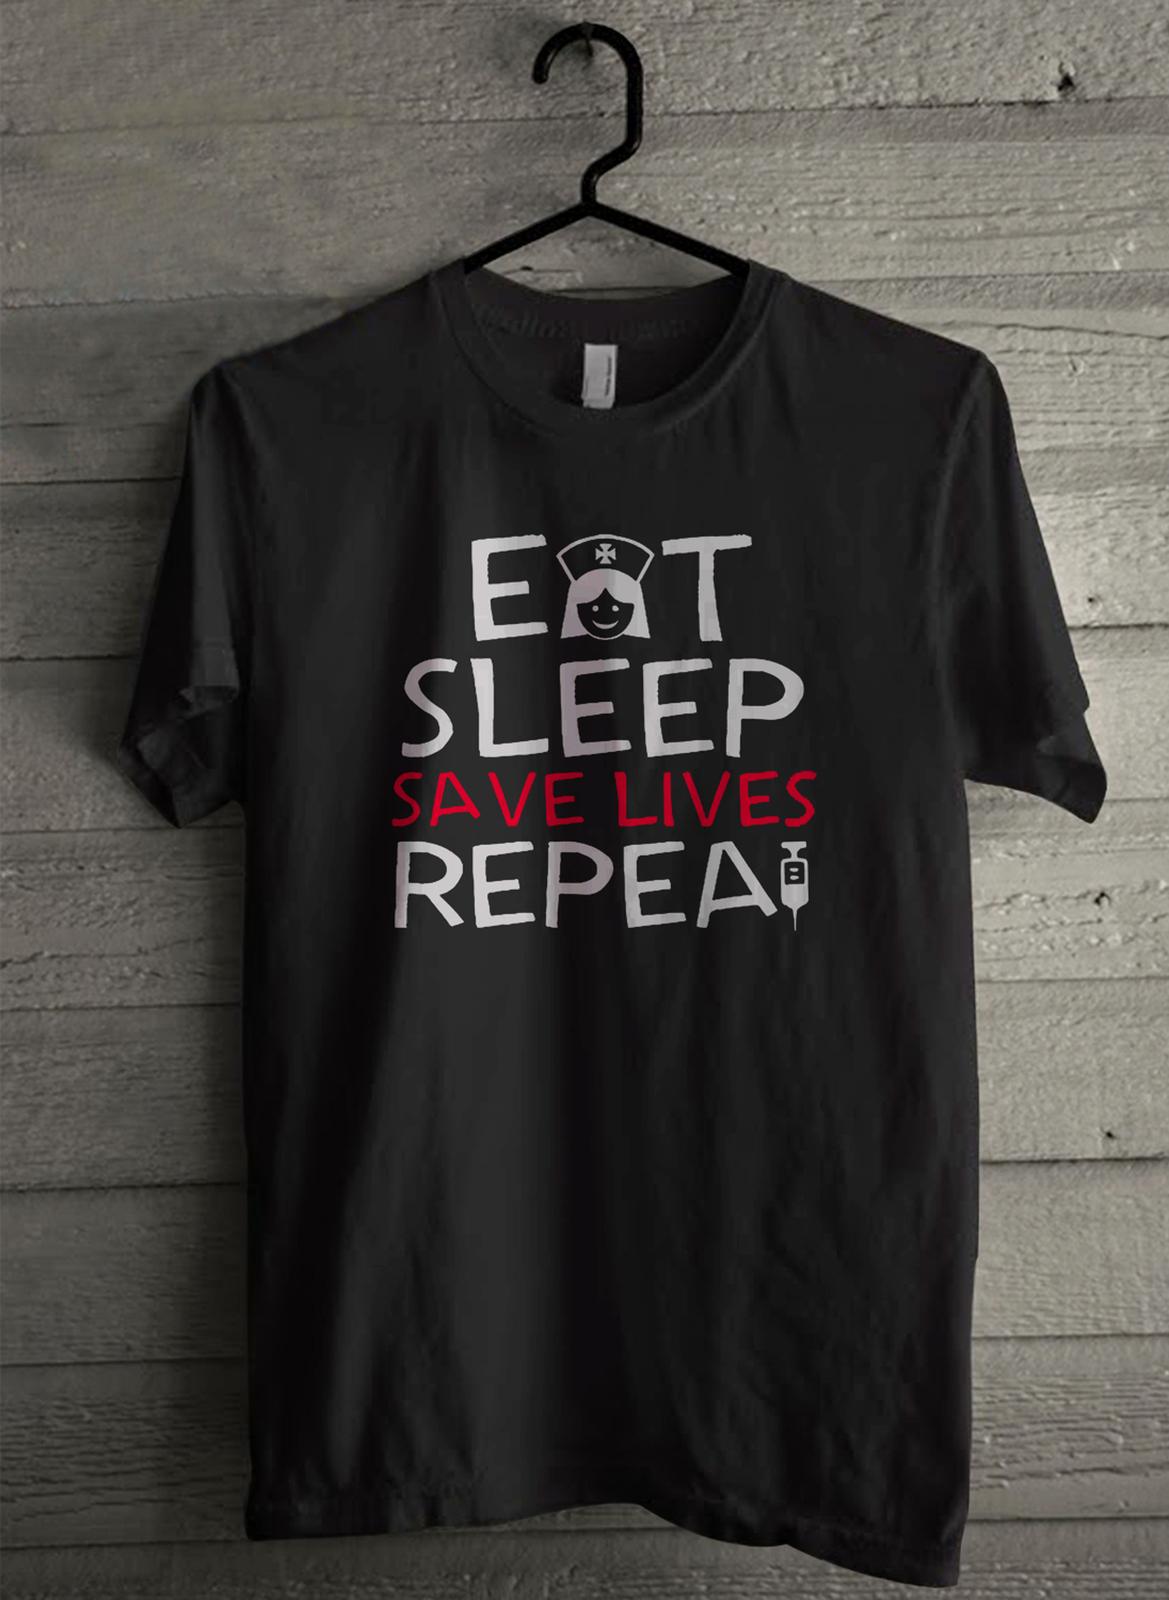 Eat sleep save lives repea - Custom Men's T-Shirt (3910)